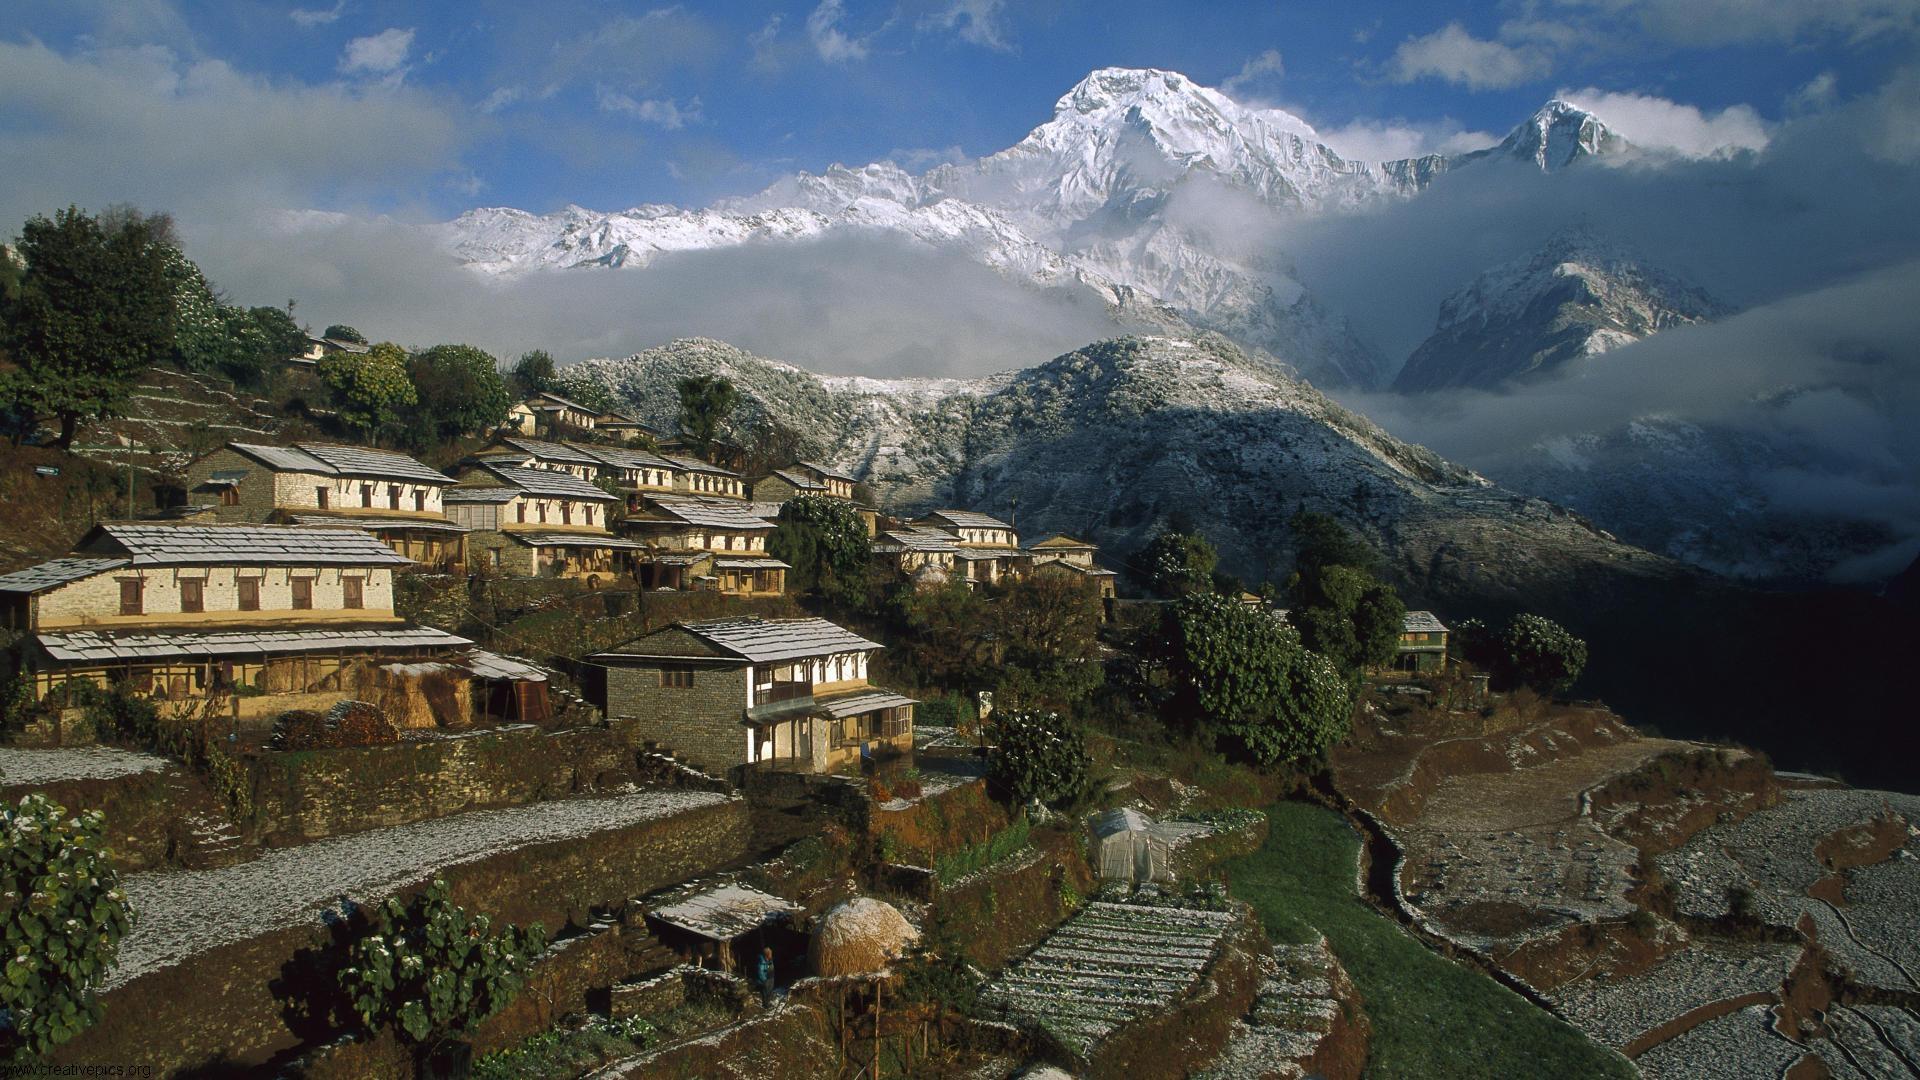 Ghangdrung Village Annapurna Conservation Area Nepal Wallpaper 1920x1080